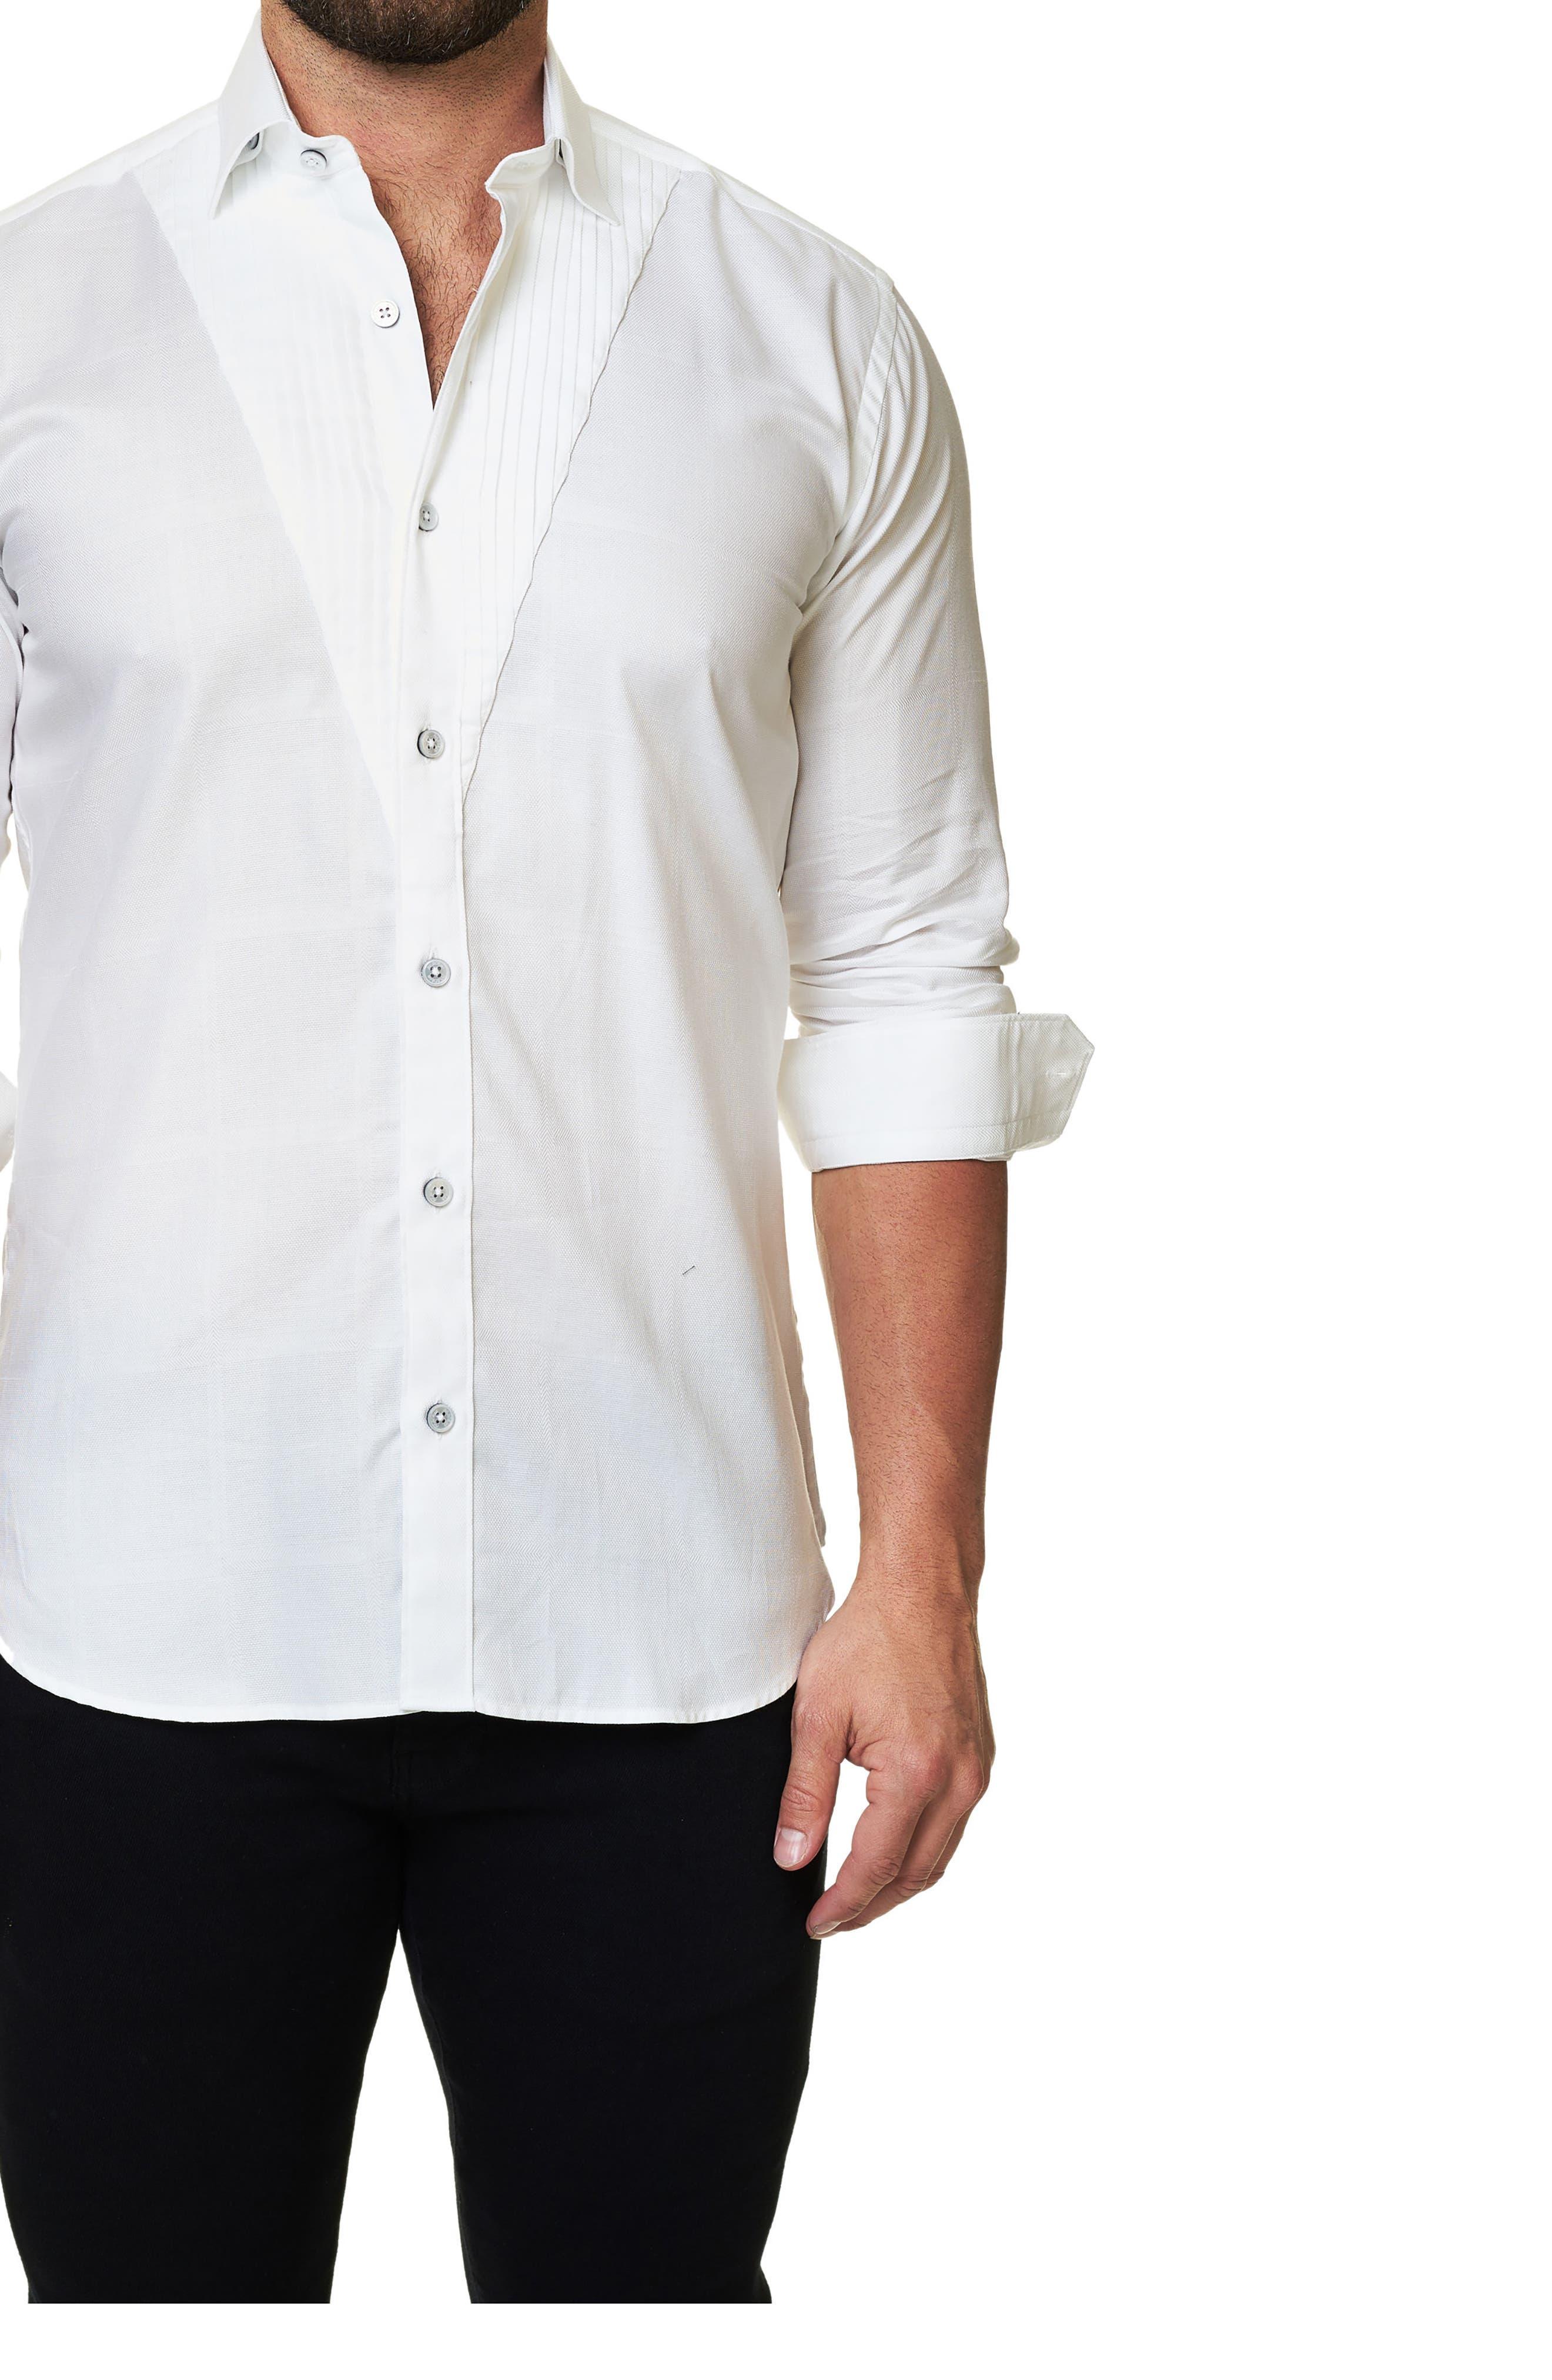 Main Image - Maceoo Trim Fit Tuxedo Panel Sport Shirt